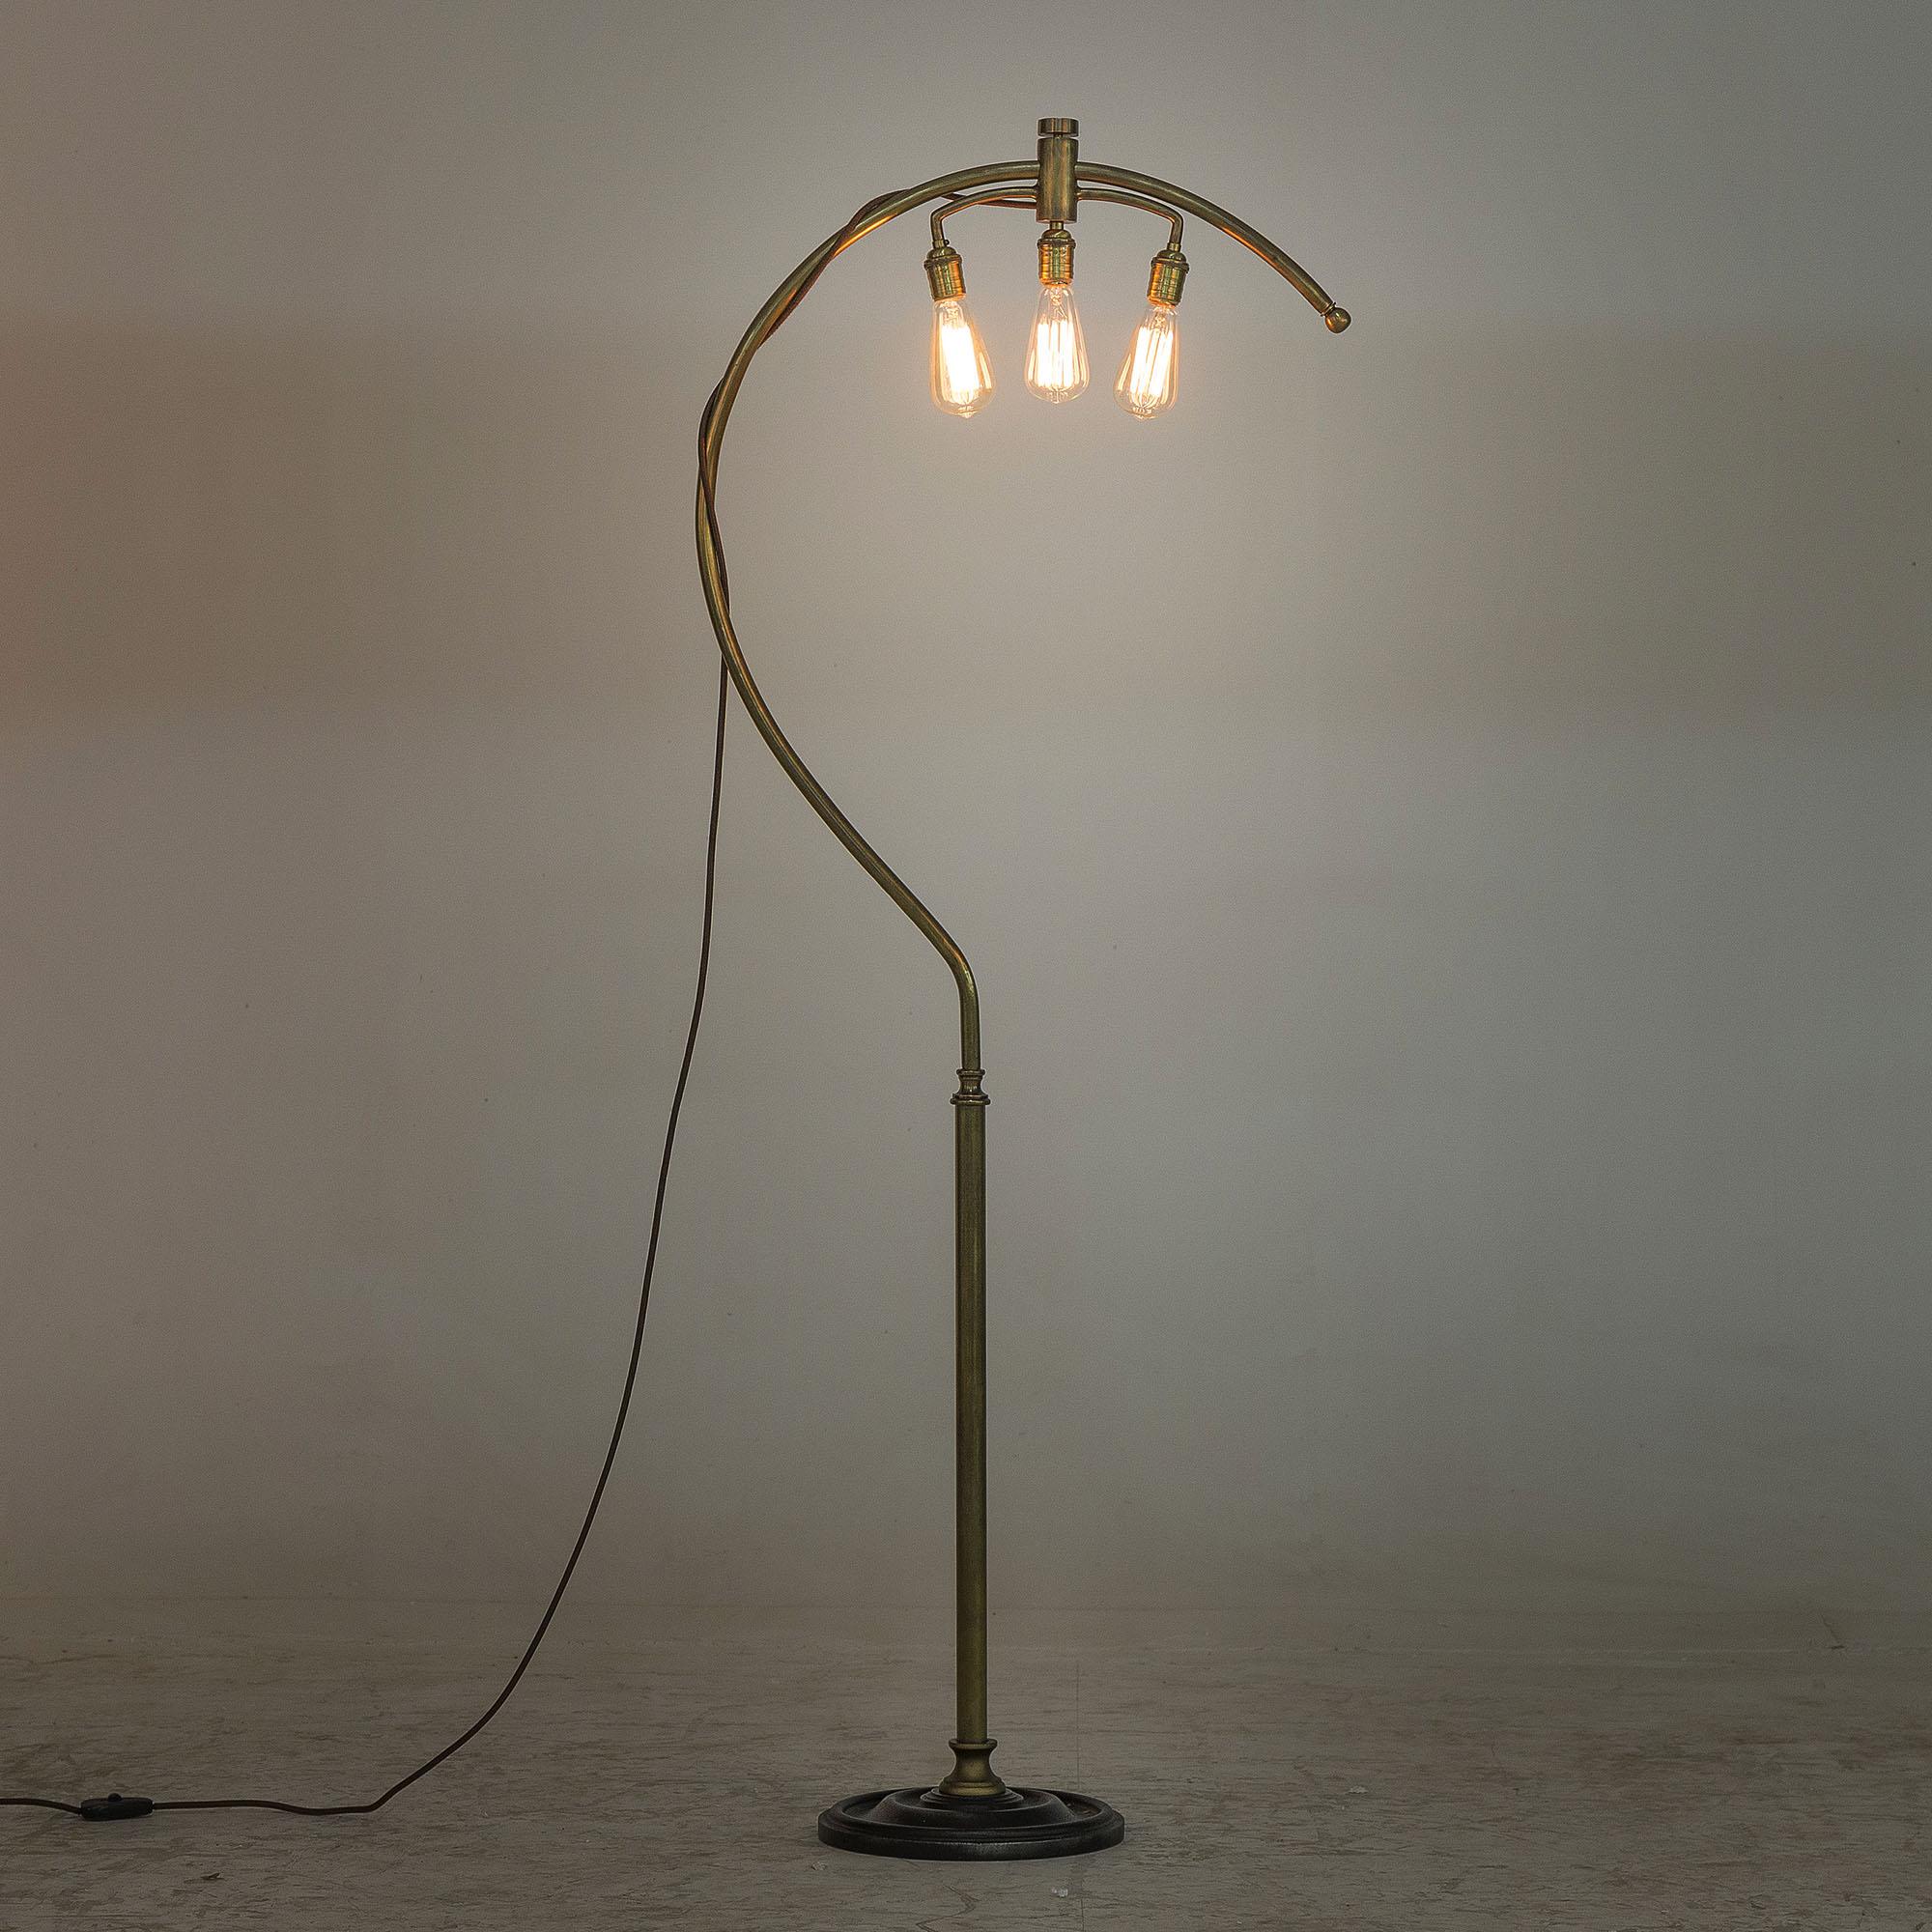 LI063F01 Cartogrpaher Floor Lamp DARK.jpg